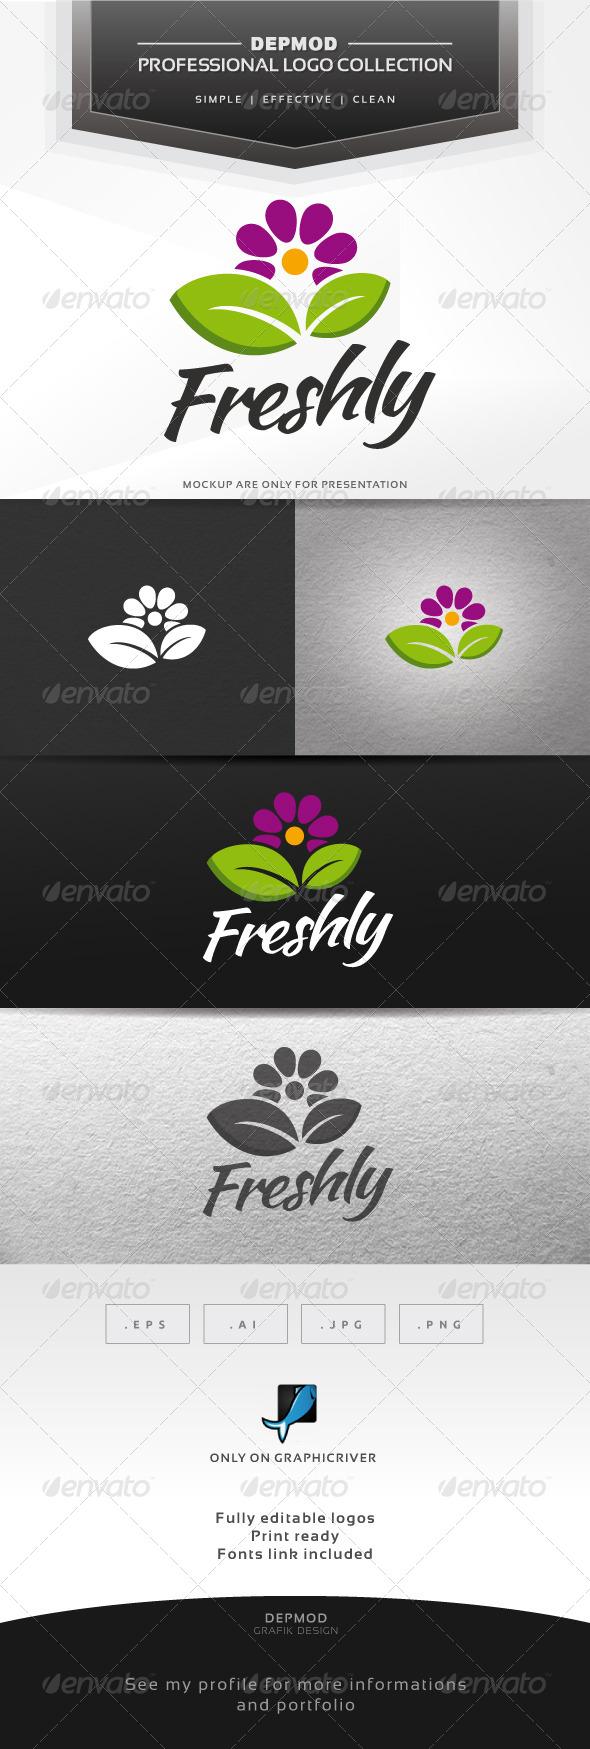 GraphicRiver Freshly Logo 7152651